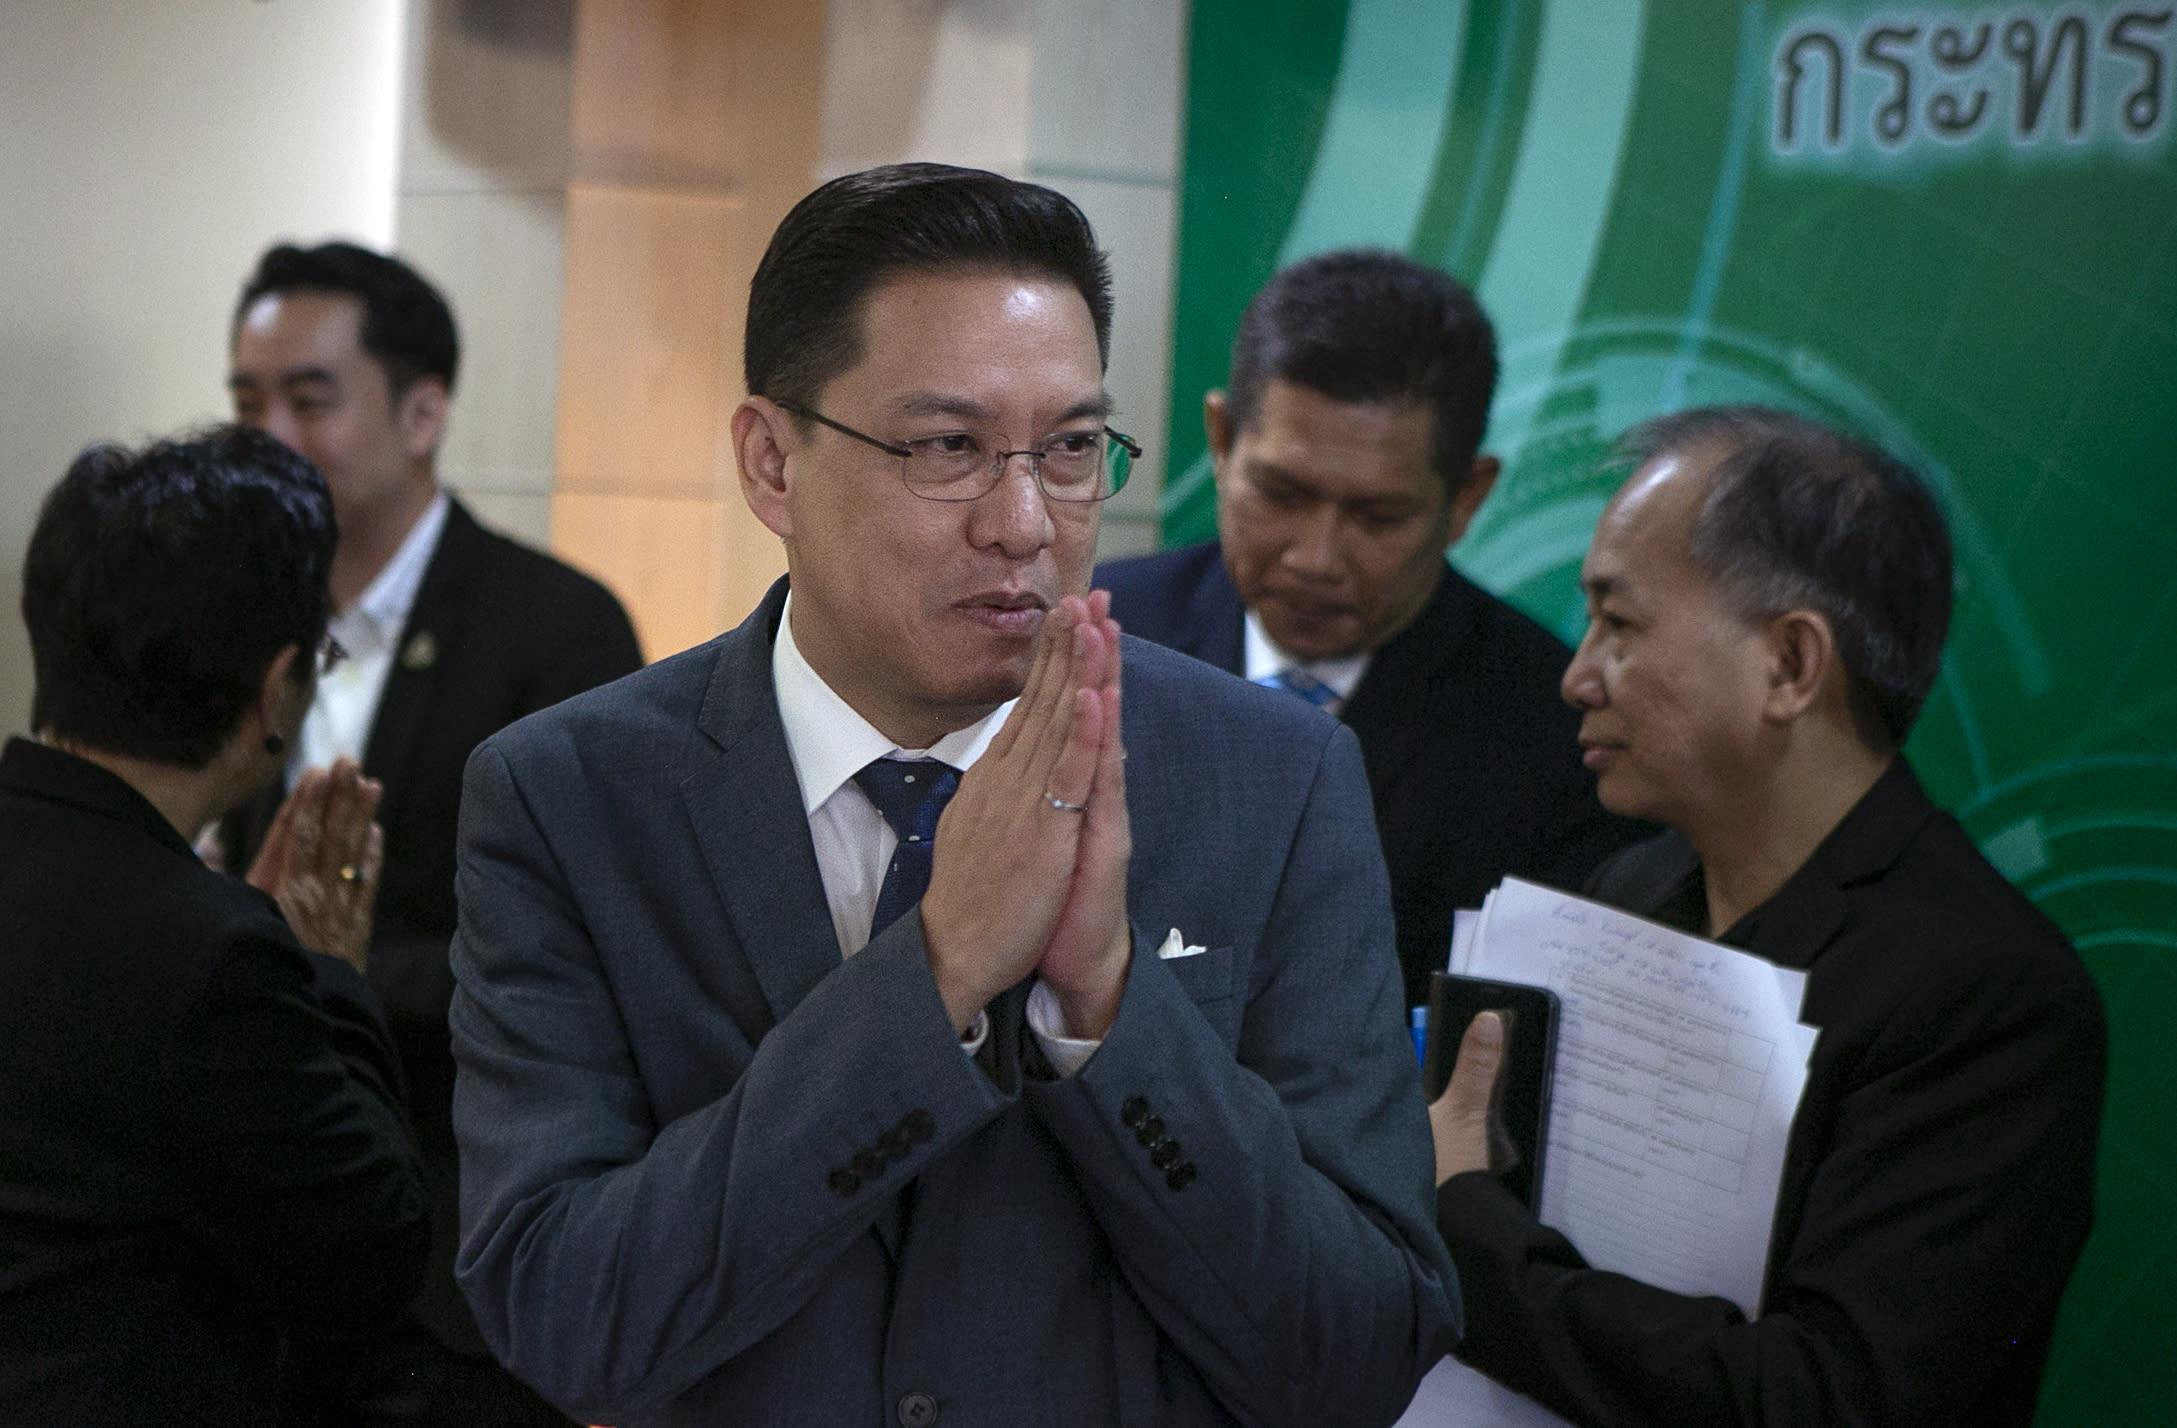 Thailand to set up center to combat 'fake news'